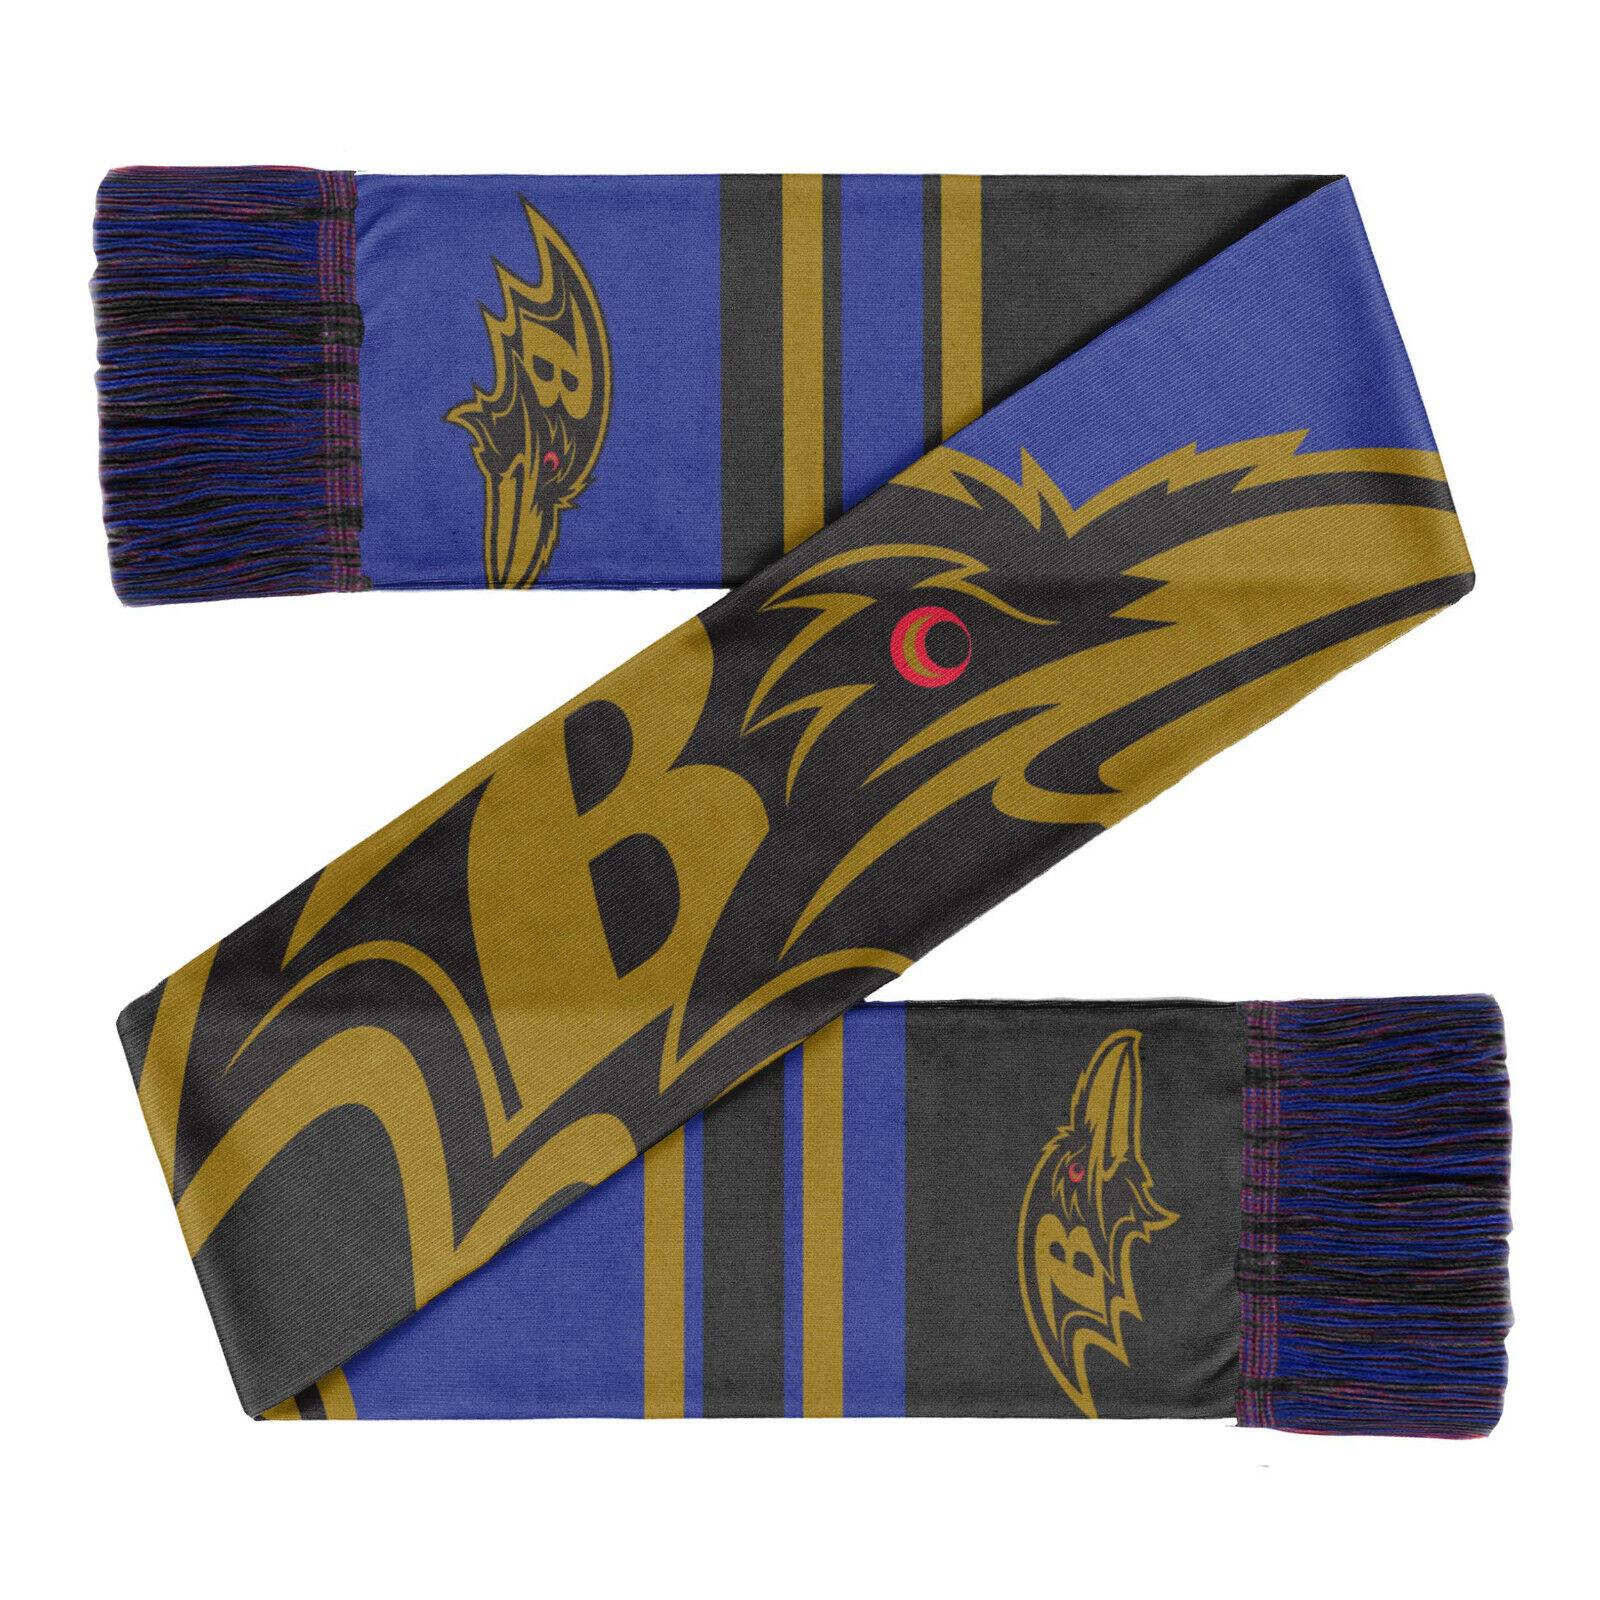 NFL Baltimore Ravens Football Fanschal Schal Scarf Color Block Foco